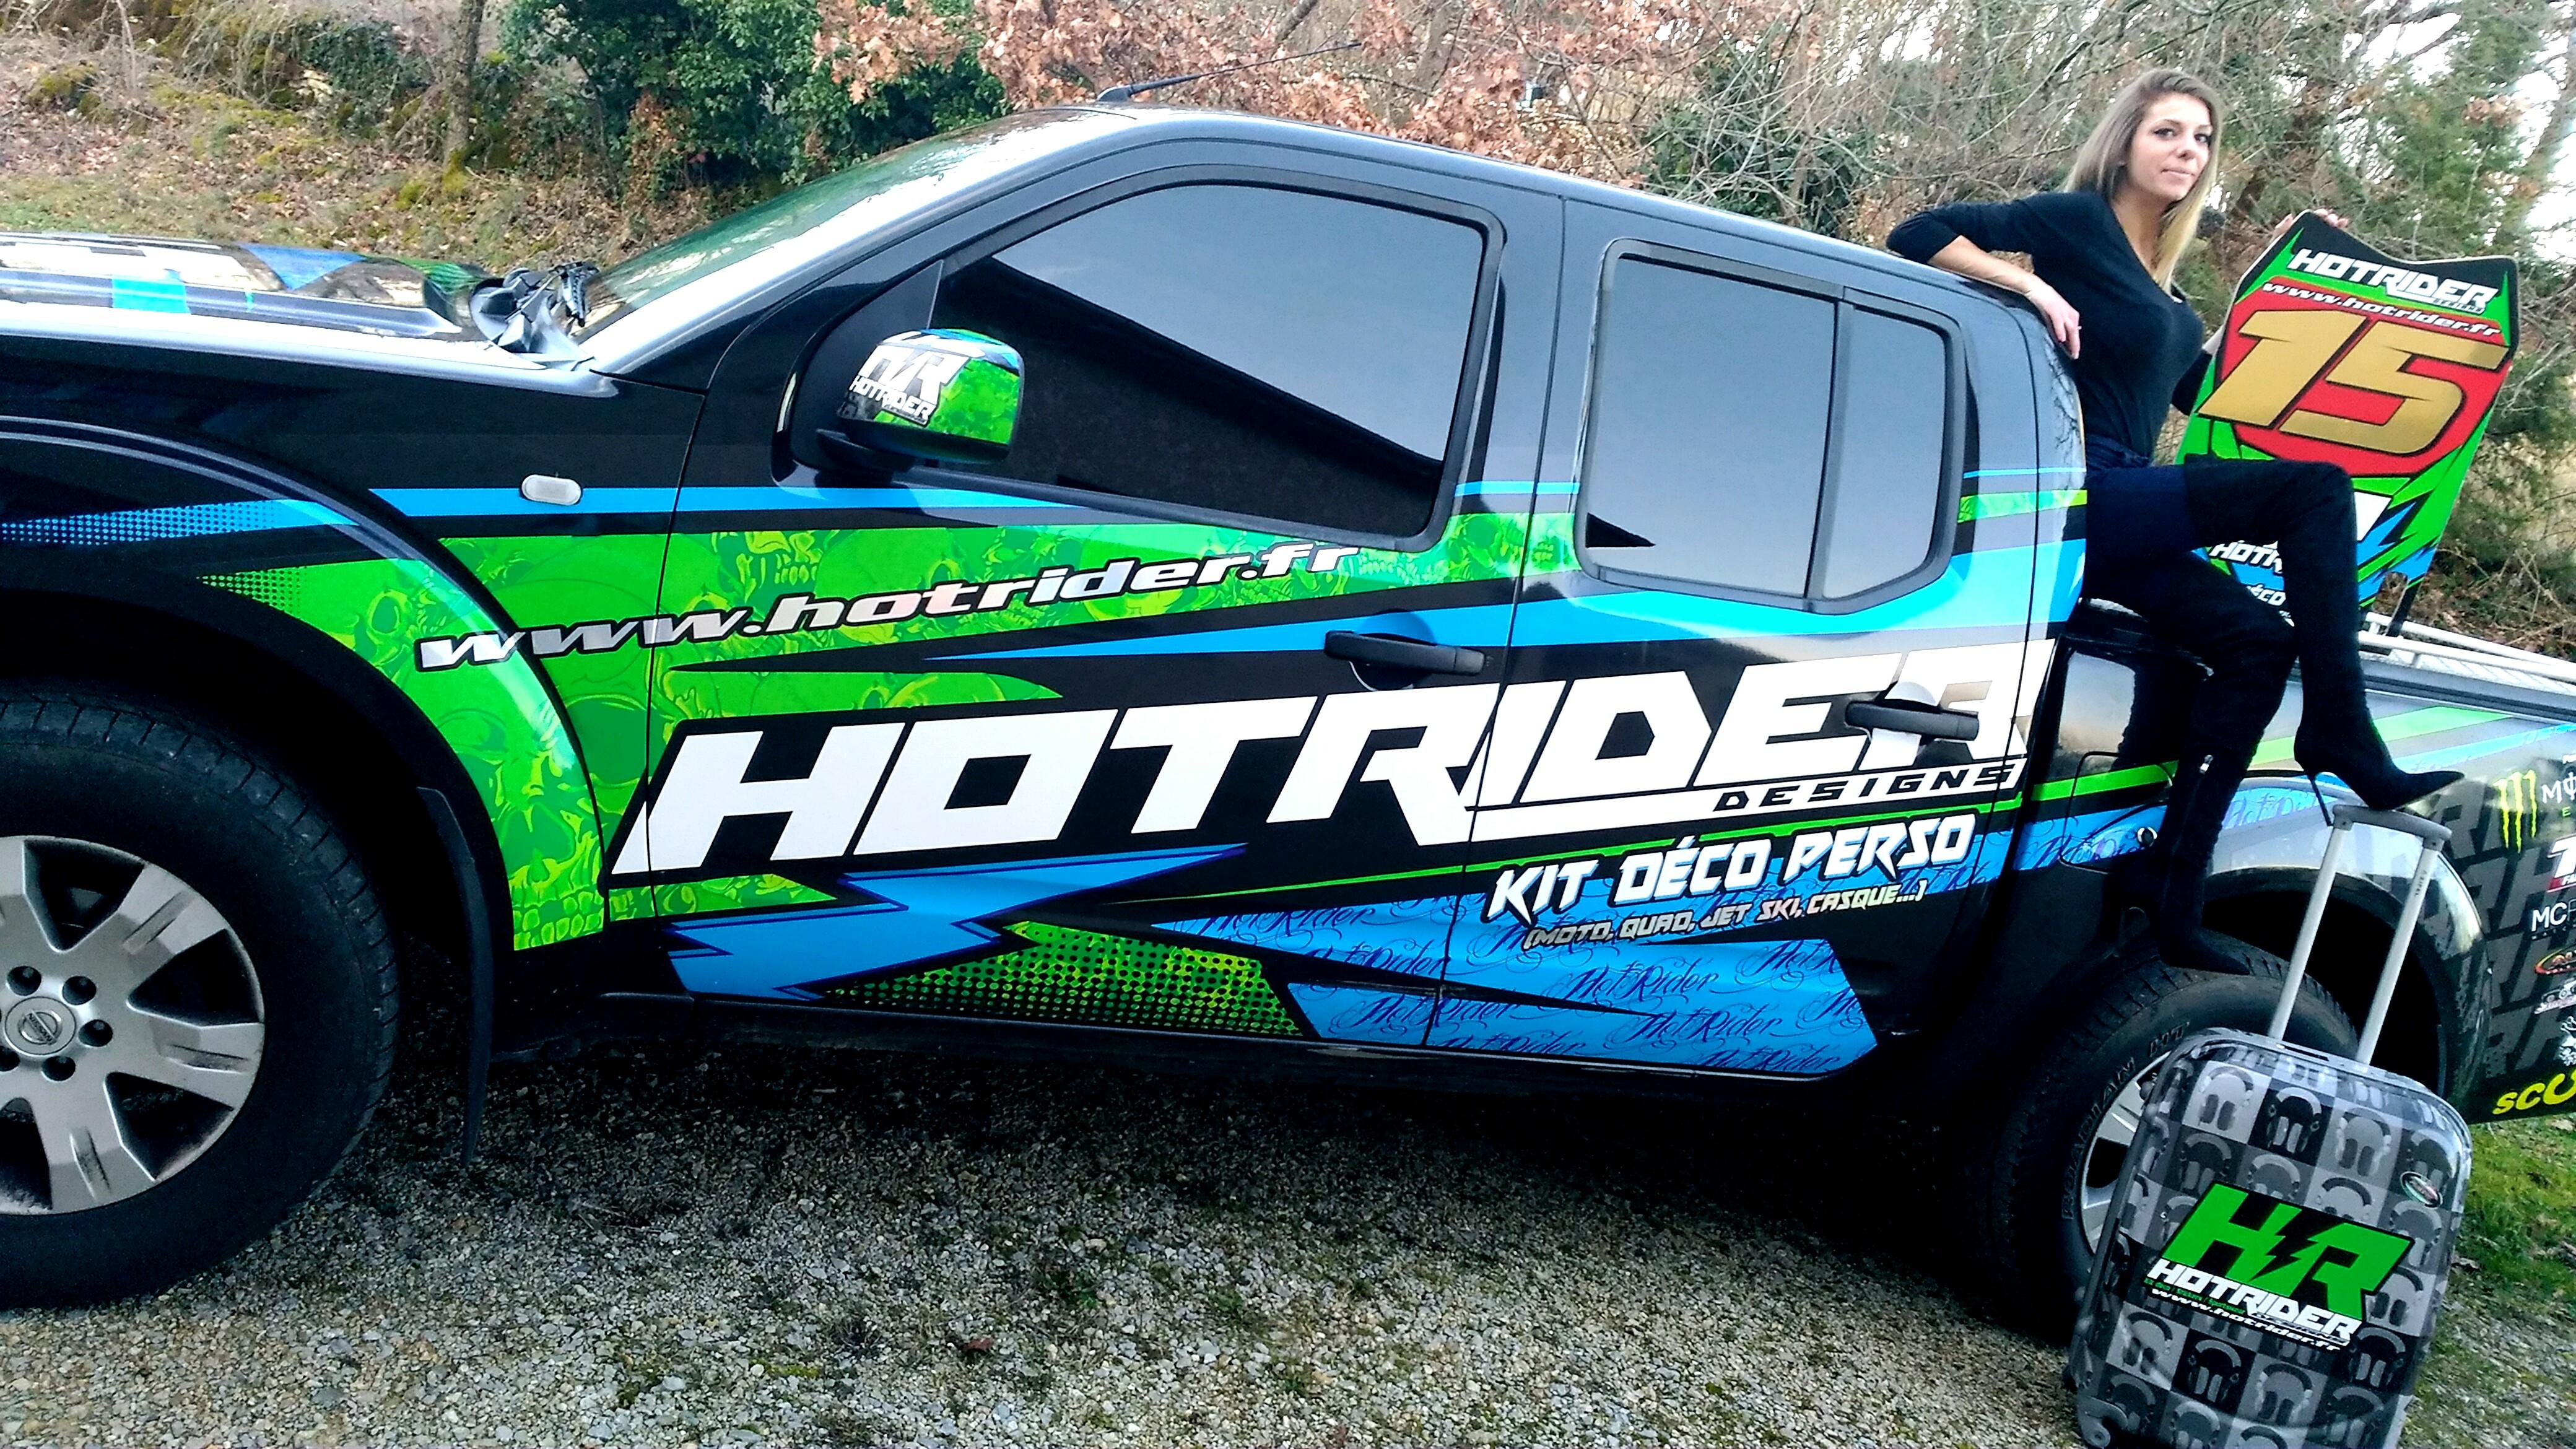 Pick up HotRider Designs